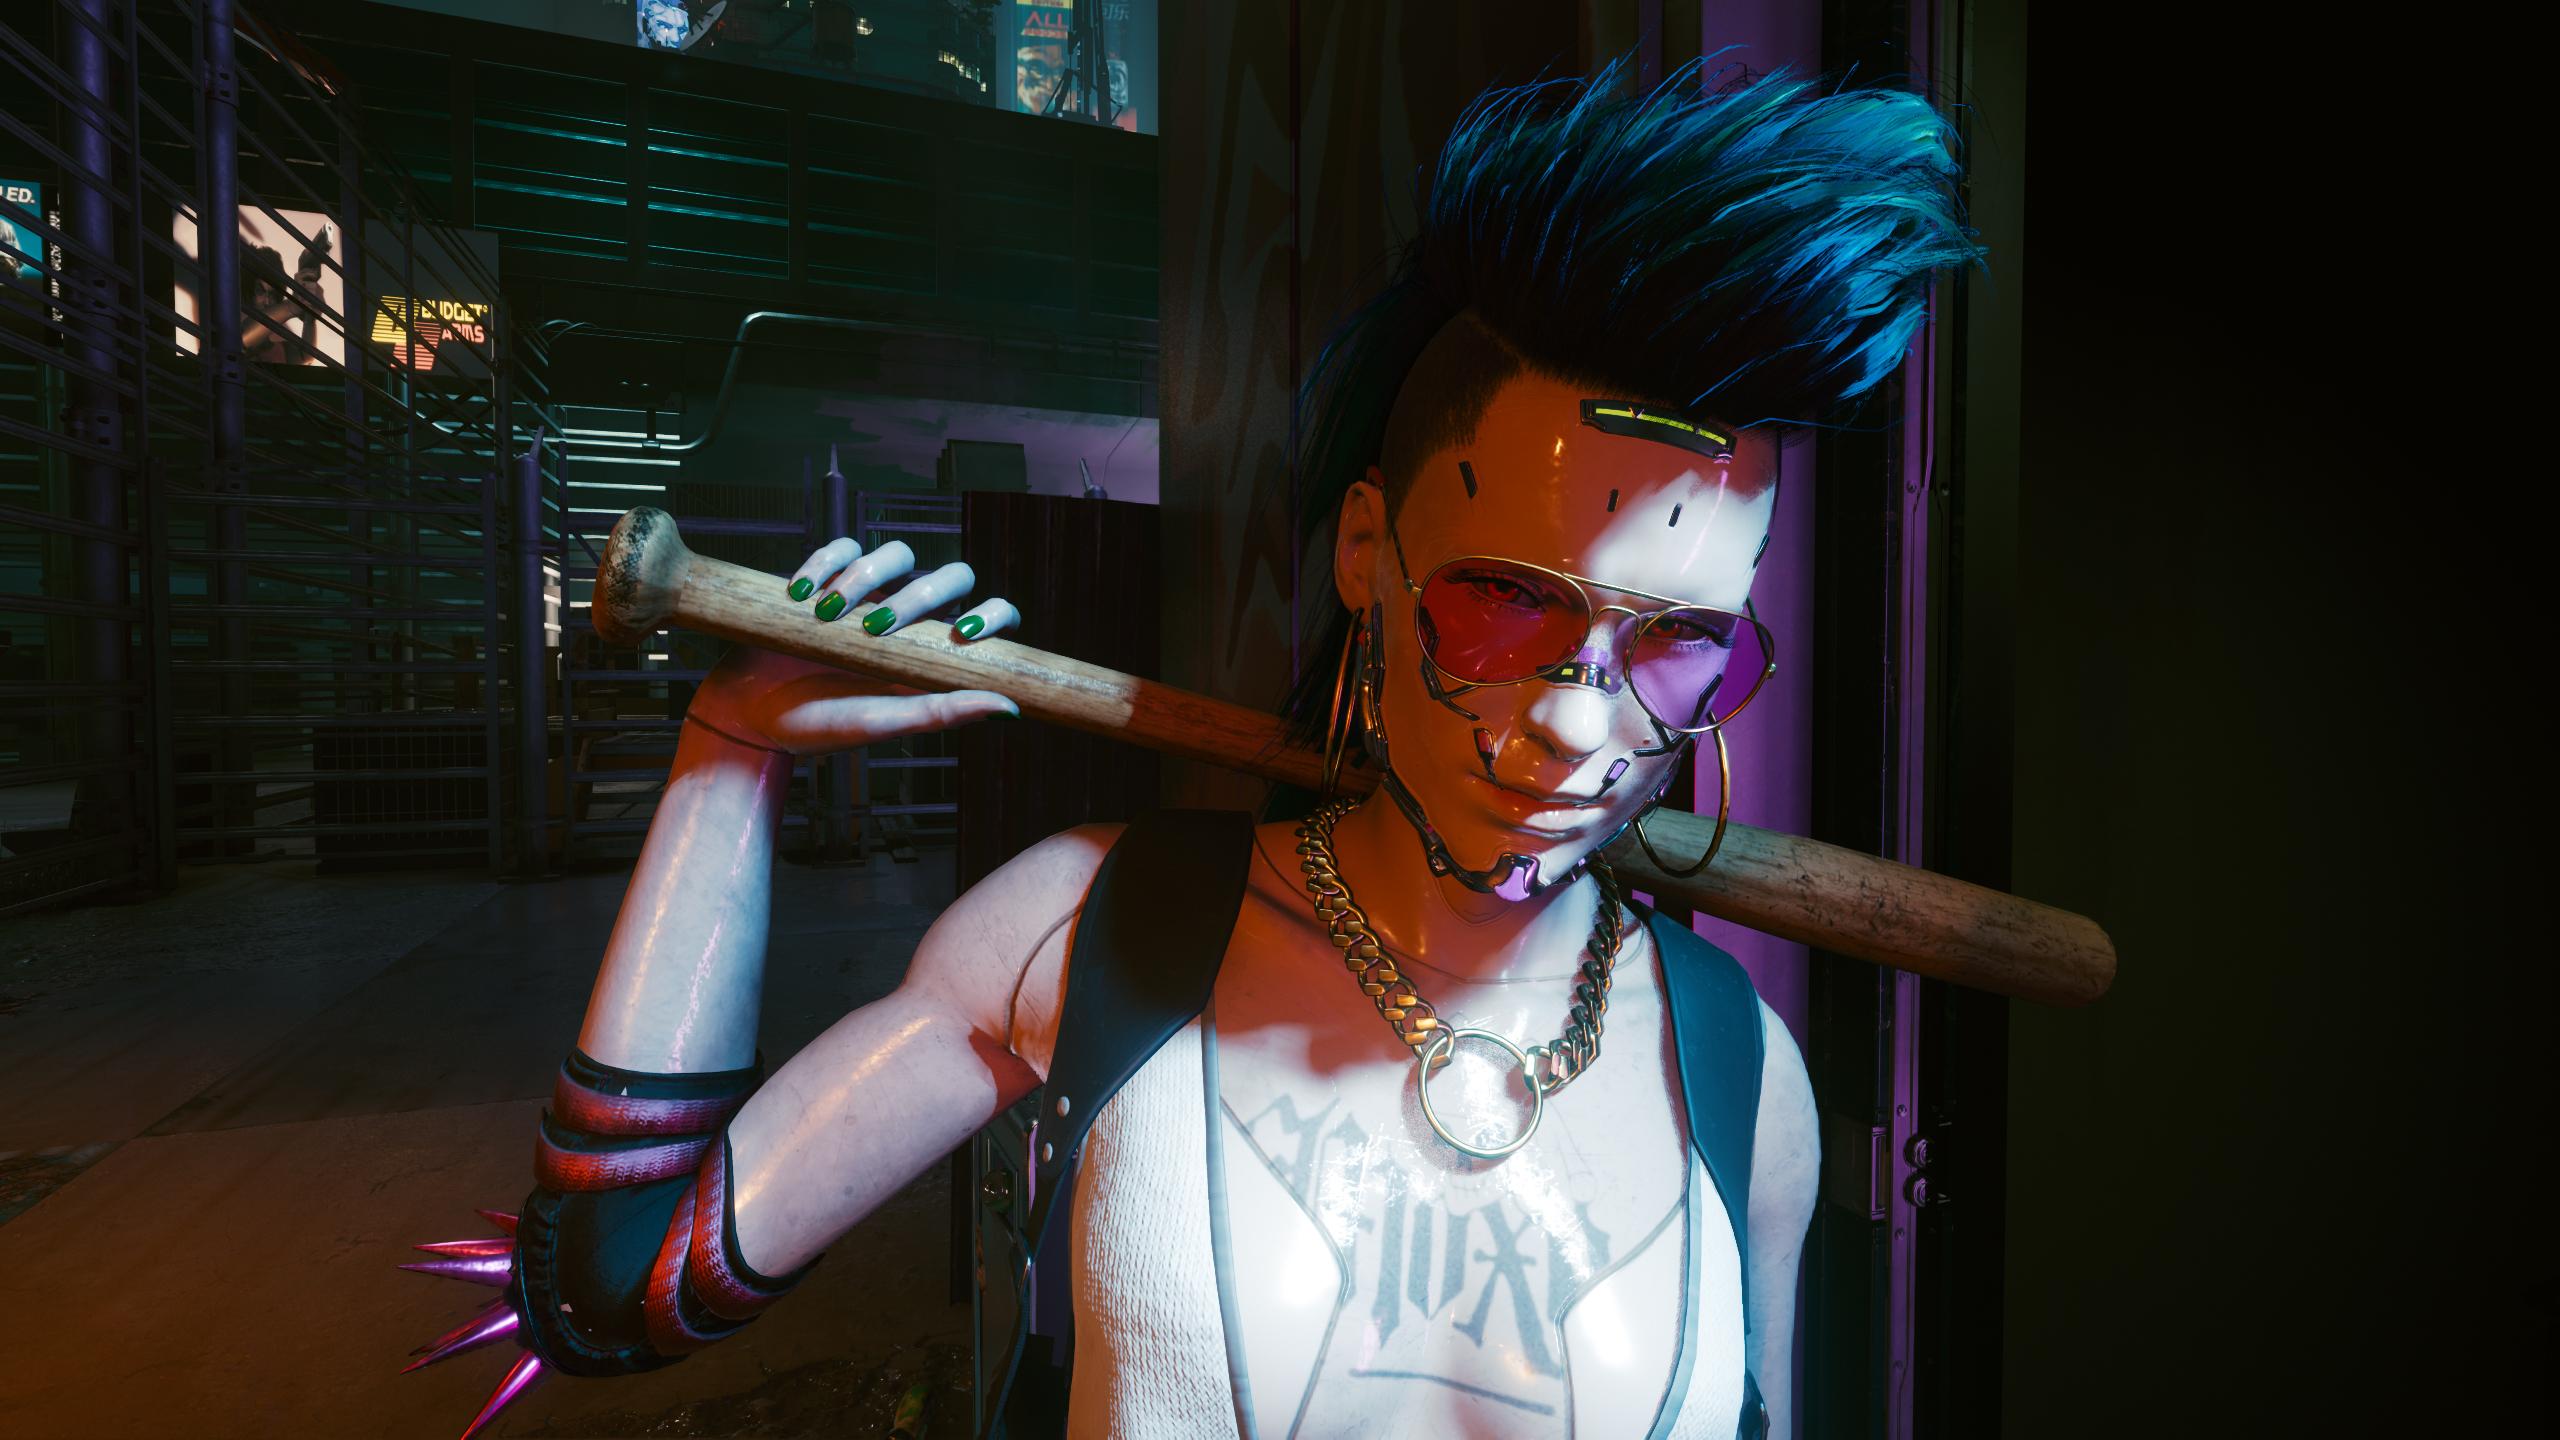 CD Projekt has 'decided to reconsider' Cyberpunk 2077's multiplayer